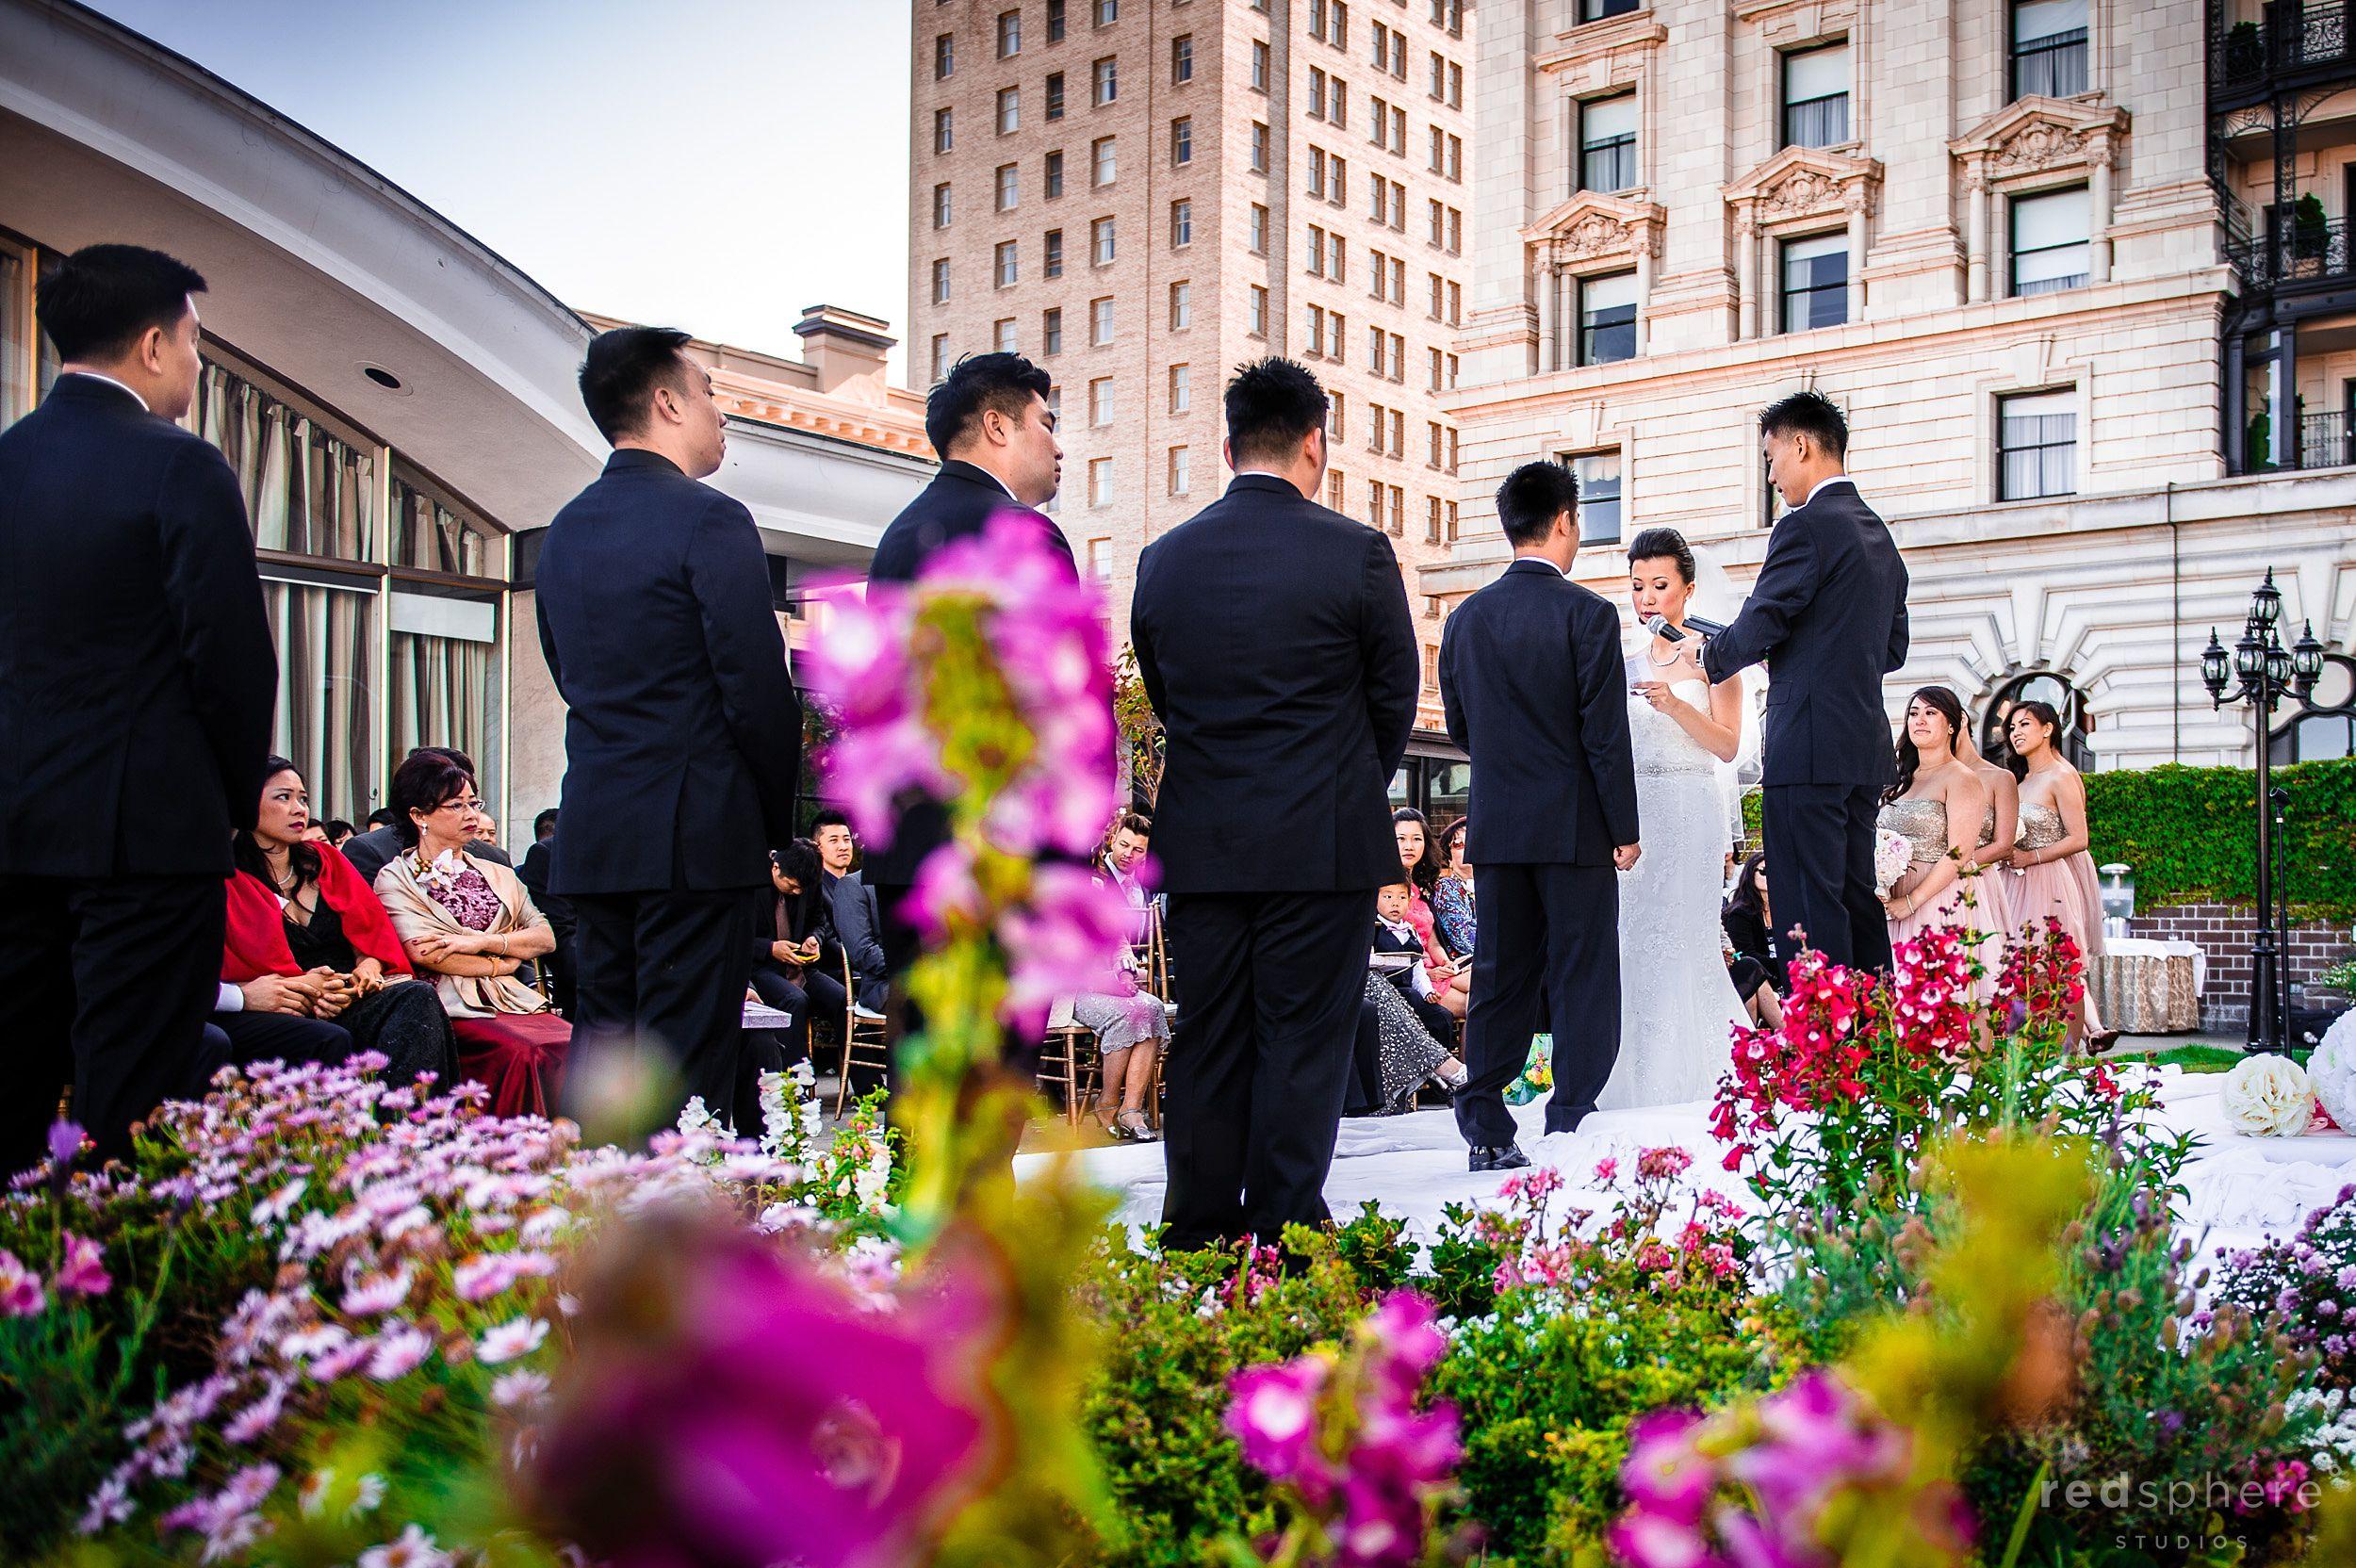 Bride, Groom, Bridemaids', and Groomsmen Behind Fairmont Hotel's Flowers